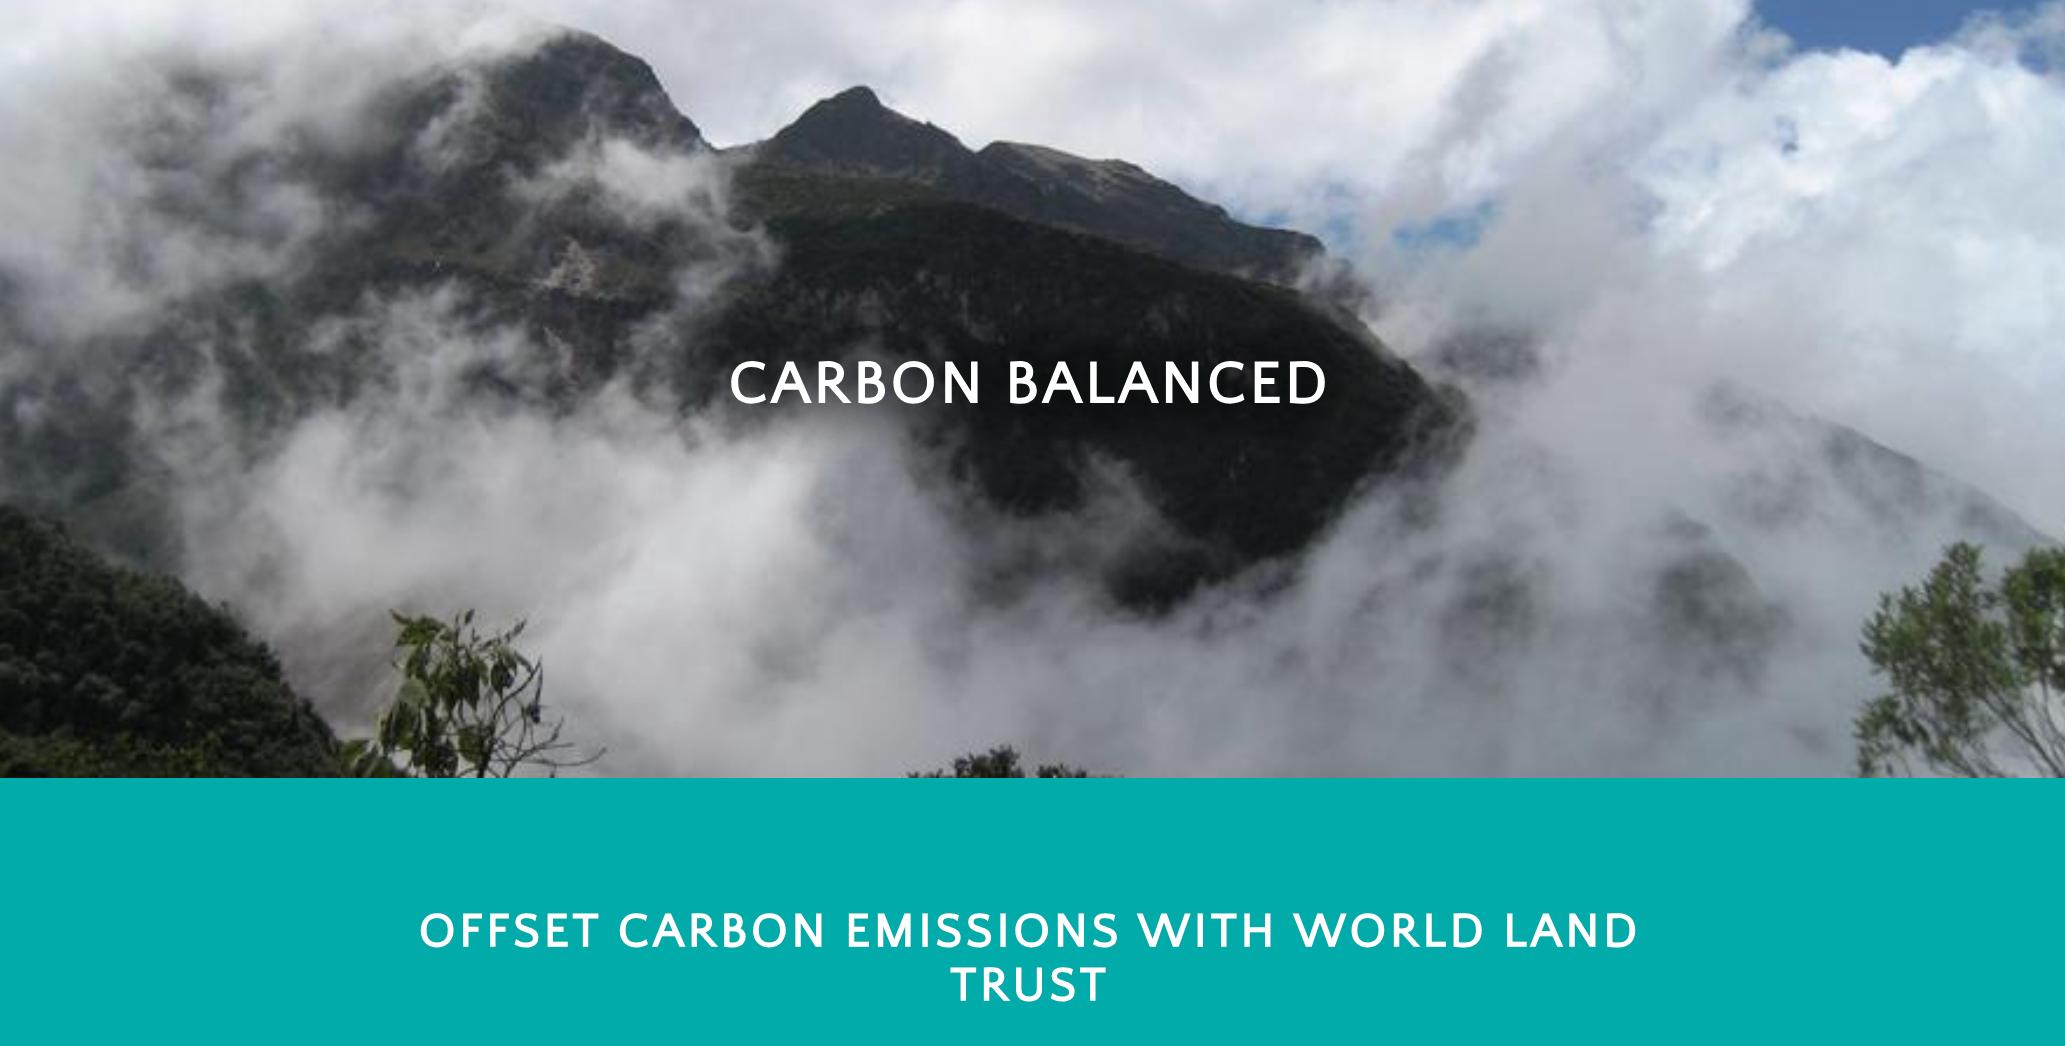 World Land Trust carbon balanced programme